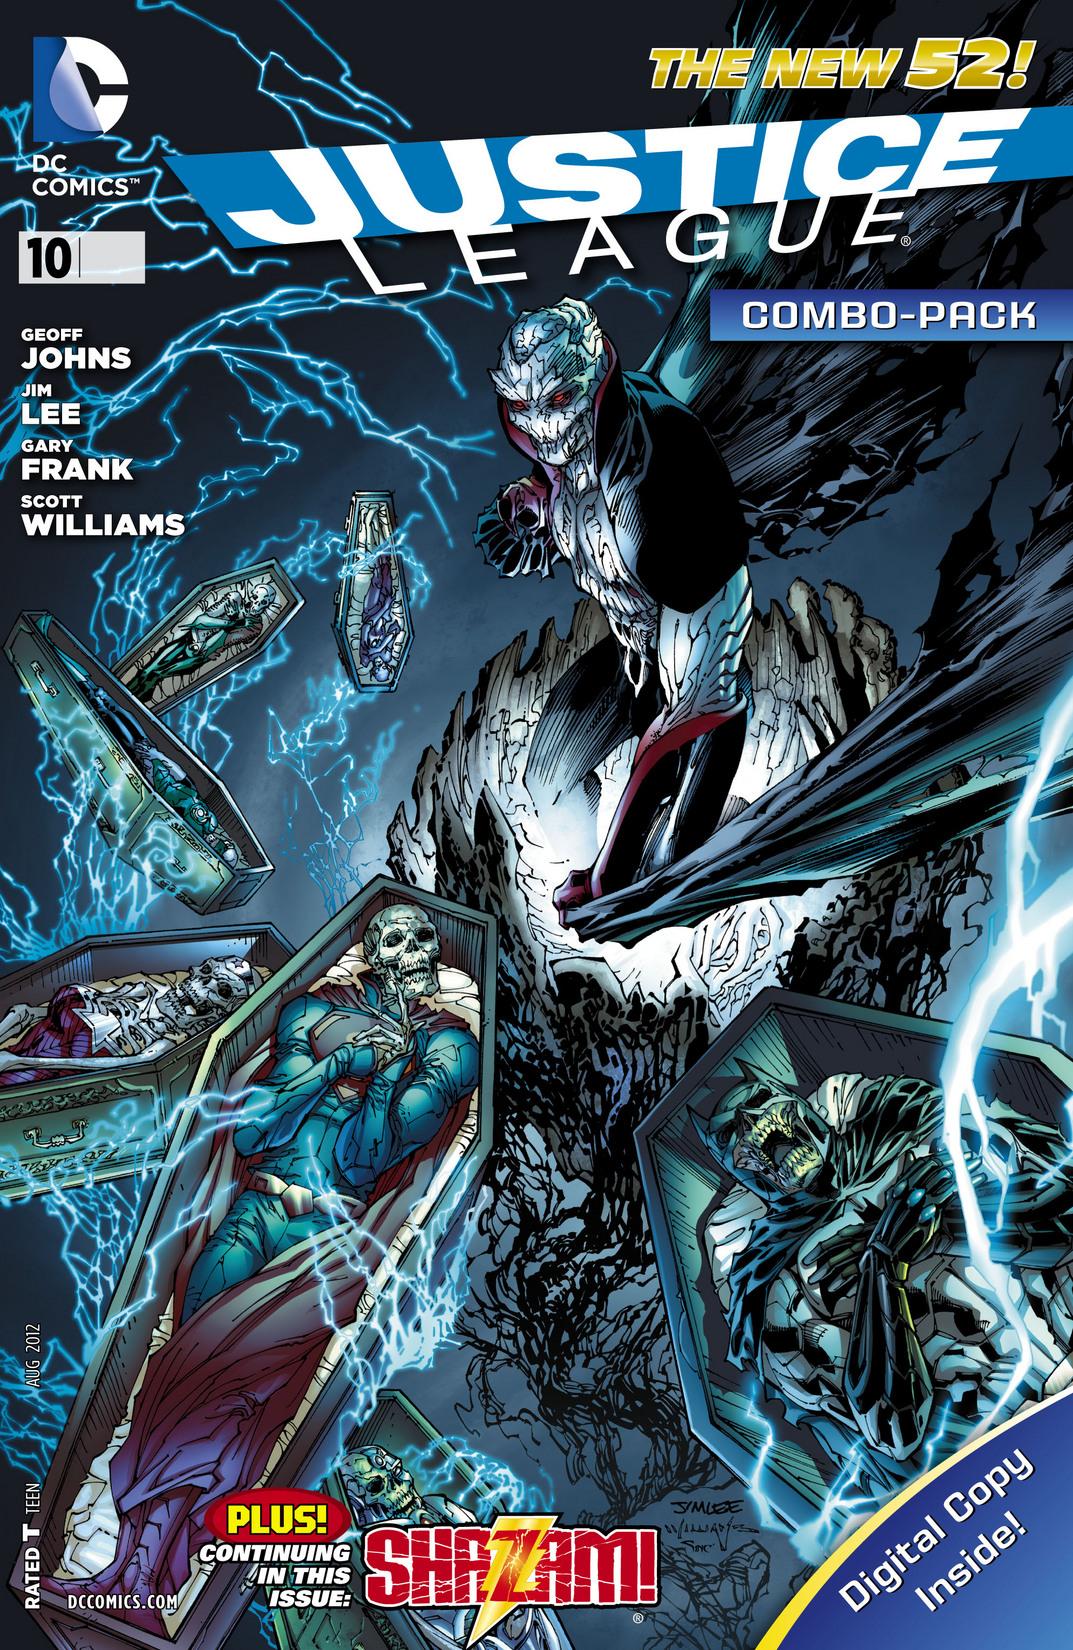 Justice League Vol 2 10 Combo.jpg